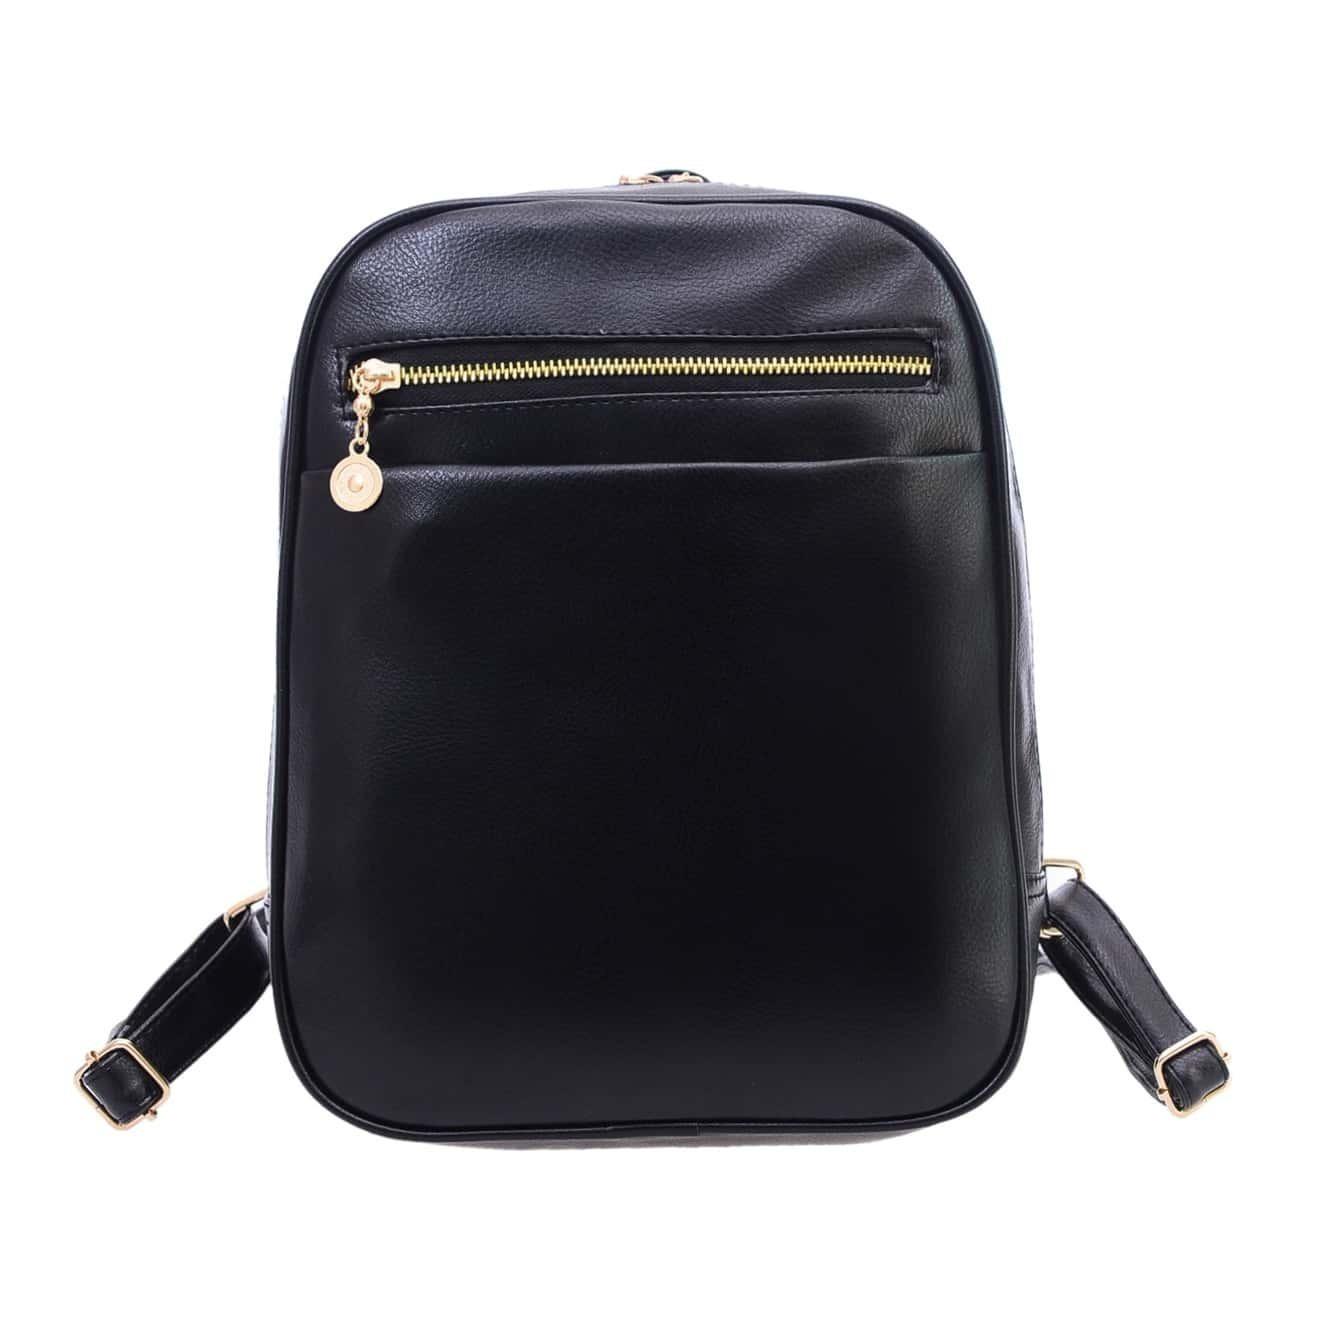 sac dos en similicuir avec zip noir french romwe. Black Bedroom Furniture Sets. Home Design Ideas